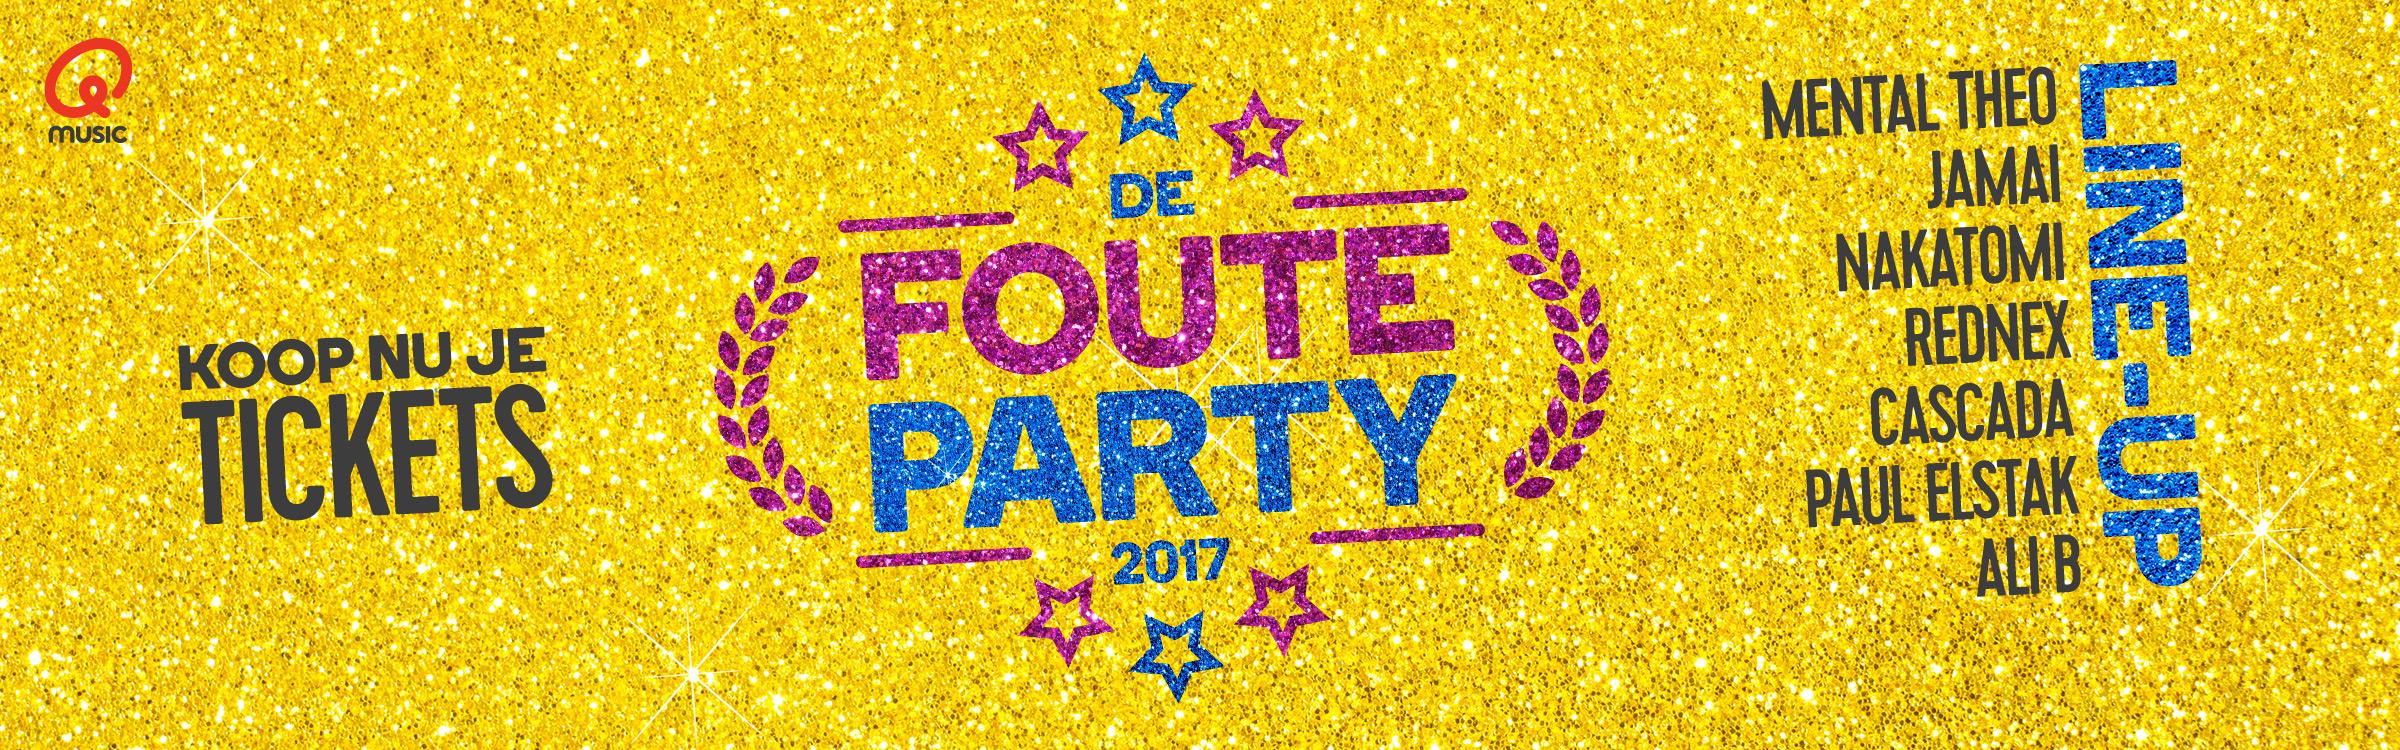 Qmusic actionheader fouteparty2017 7